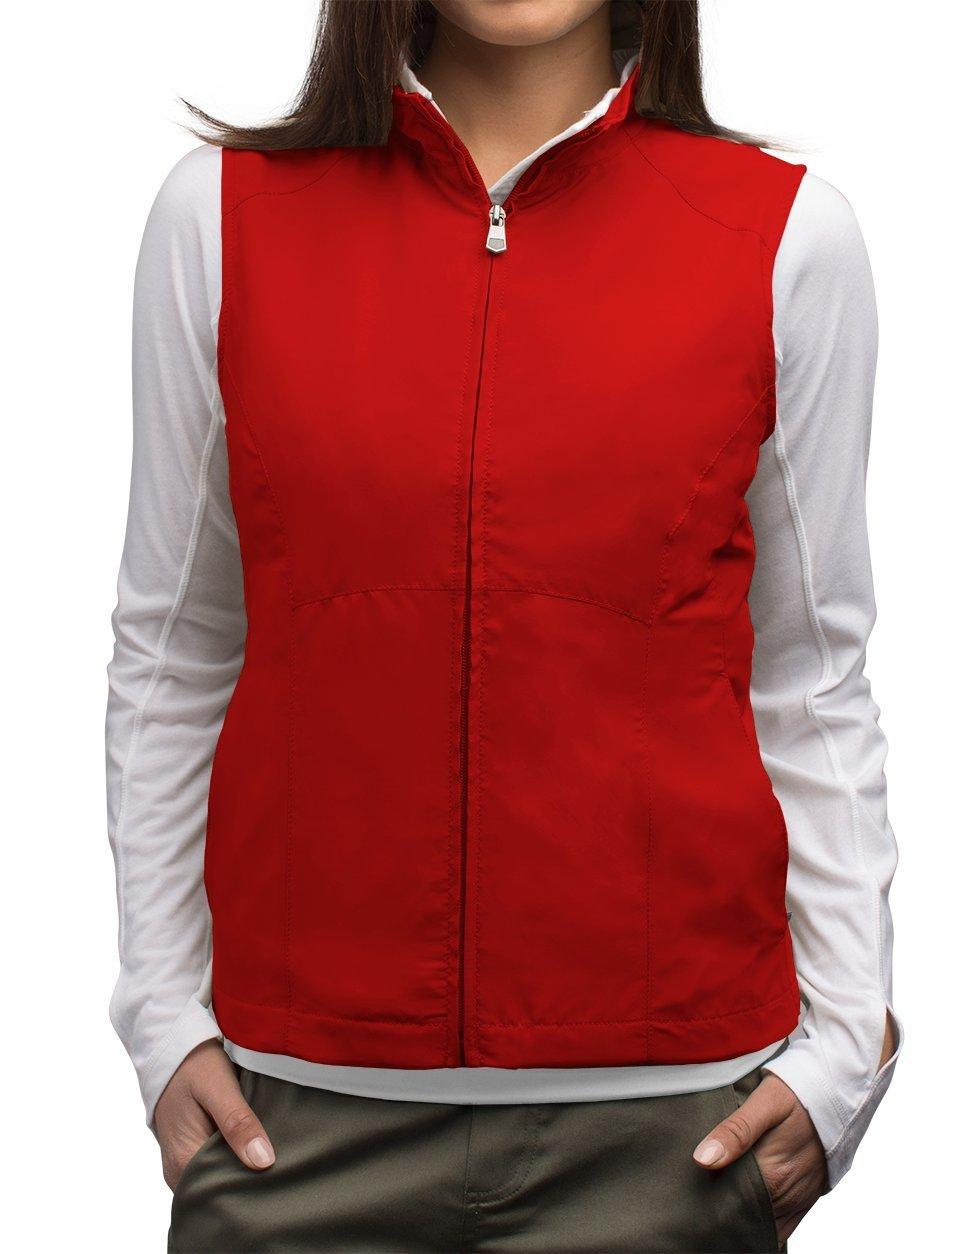 SCOTTeVEST Women's Travel Vest - 17 Pockets Travel Clothing RED XL